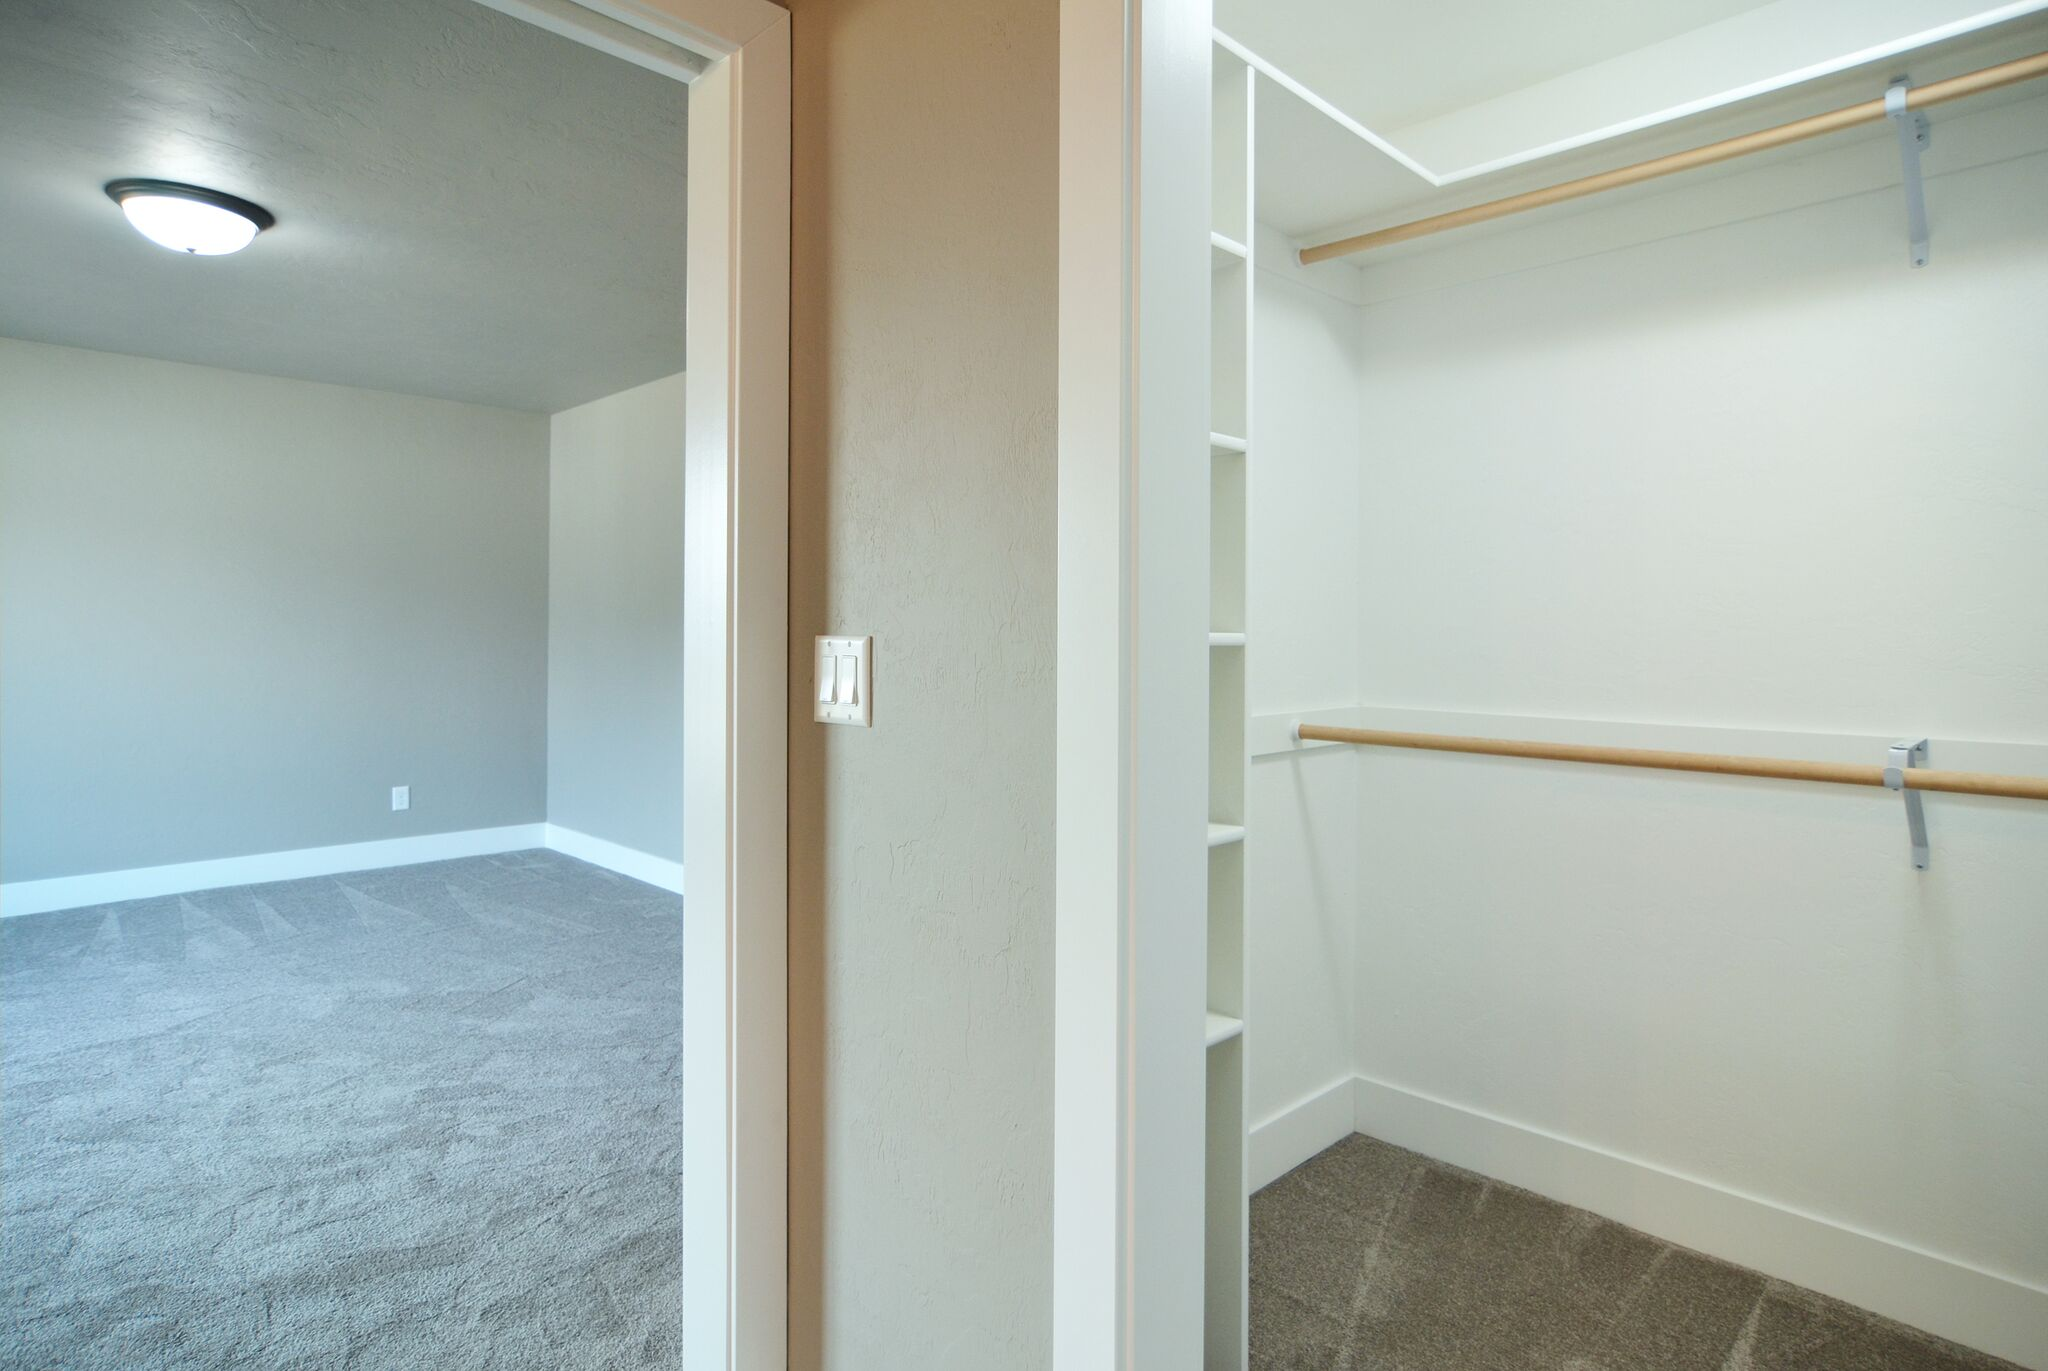 DSC_0179 - 2nd Floor.jpg